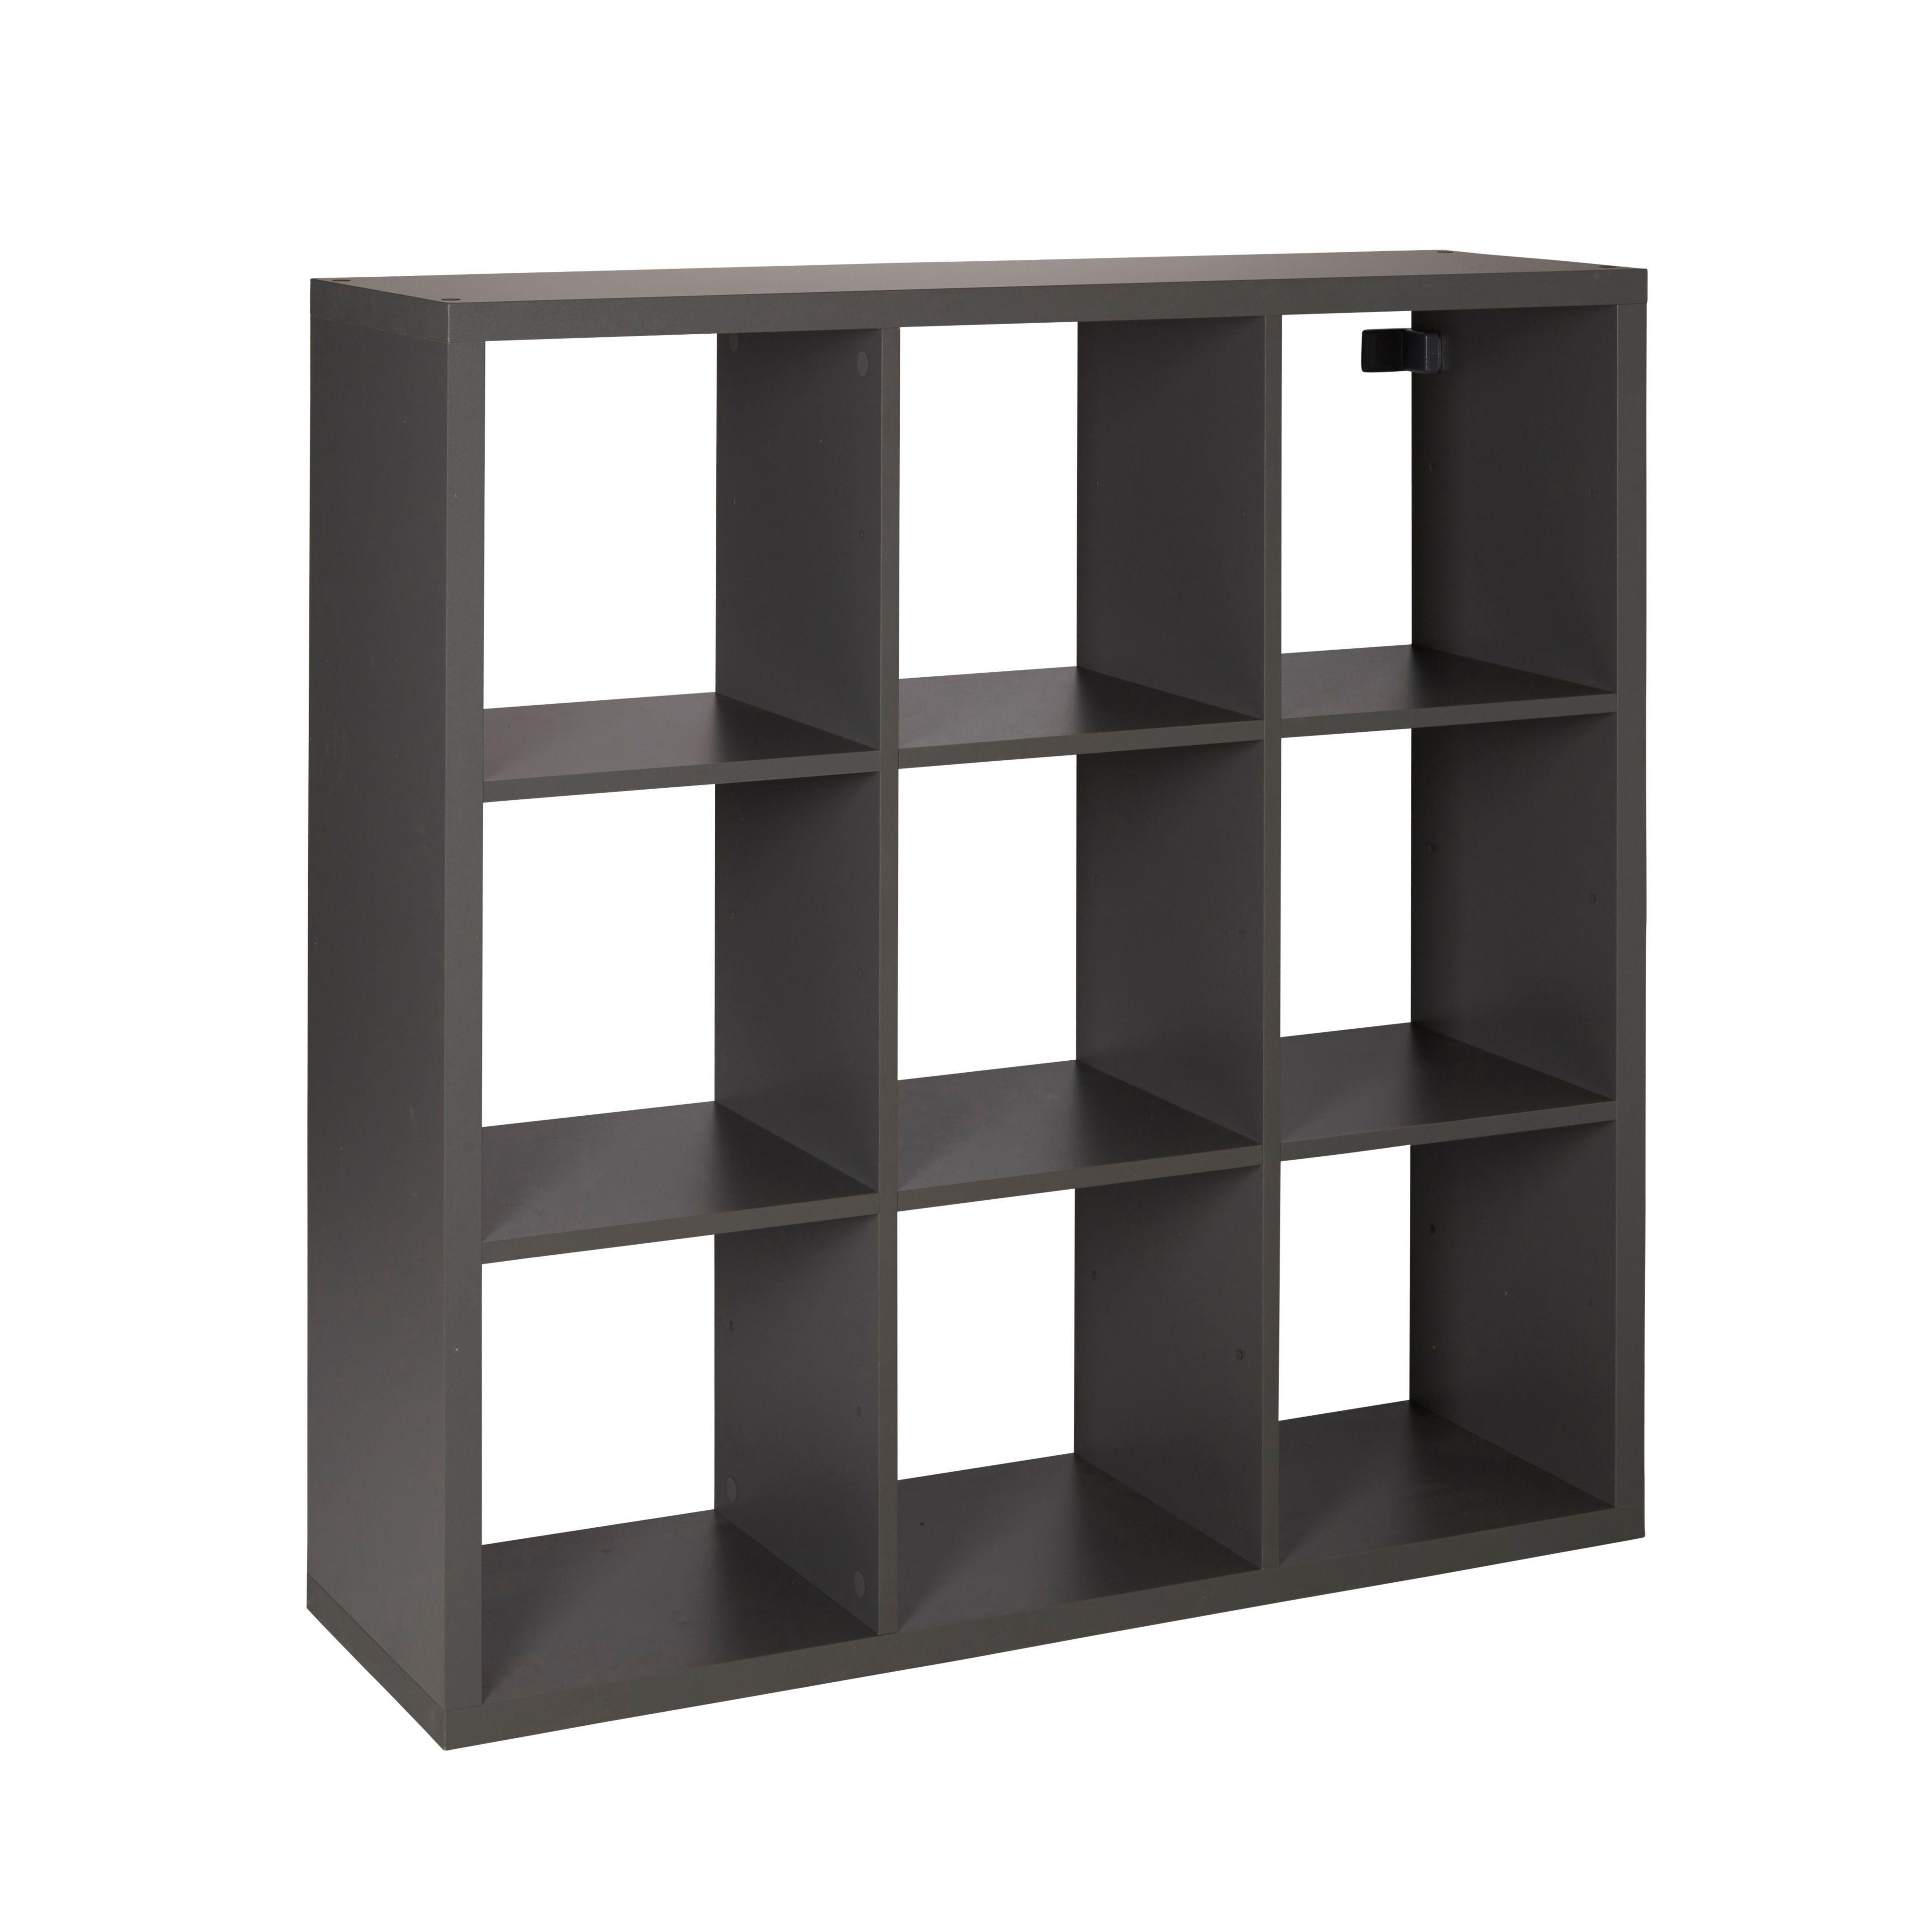 Form Mixxit Grey 9 Cube Shelving Unit (h)1080mm (w)1080mm